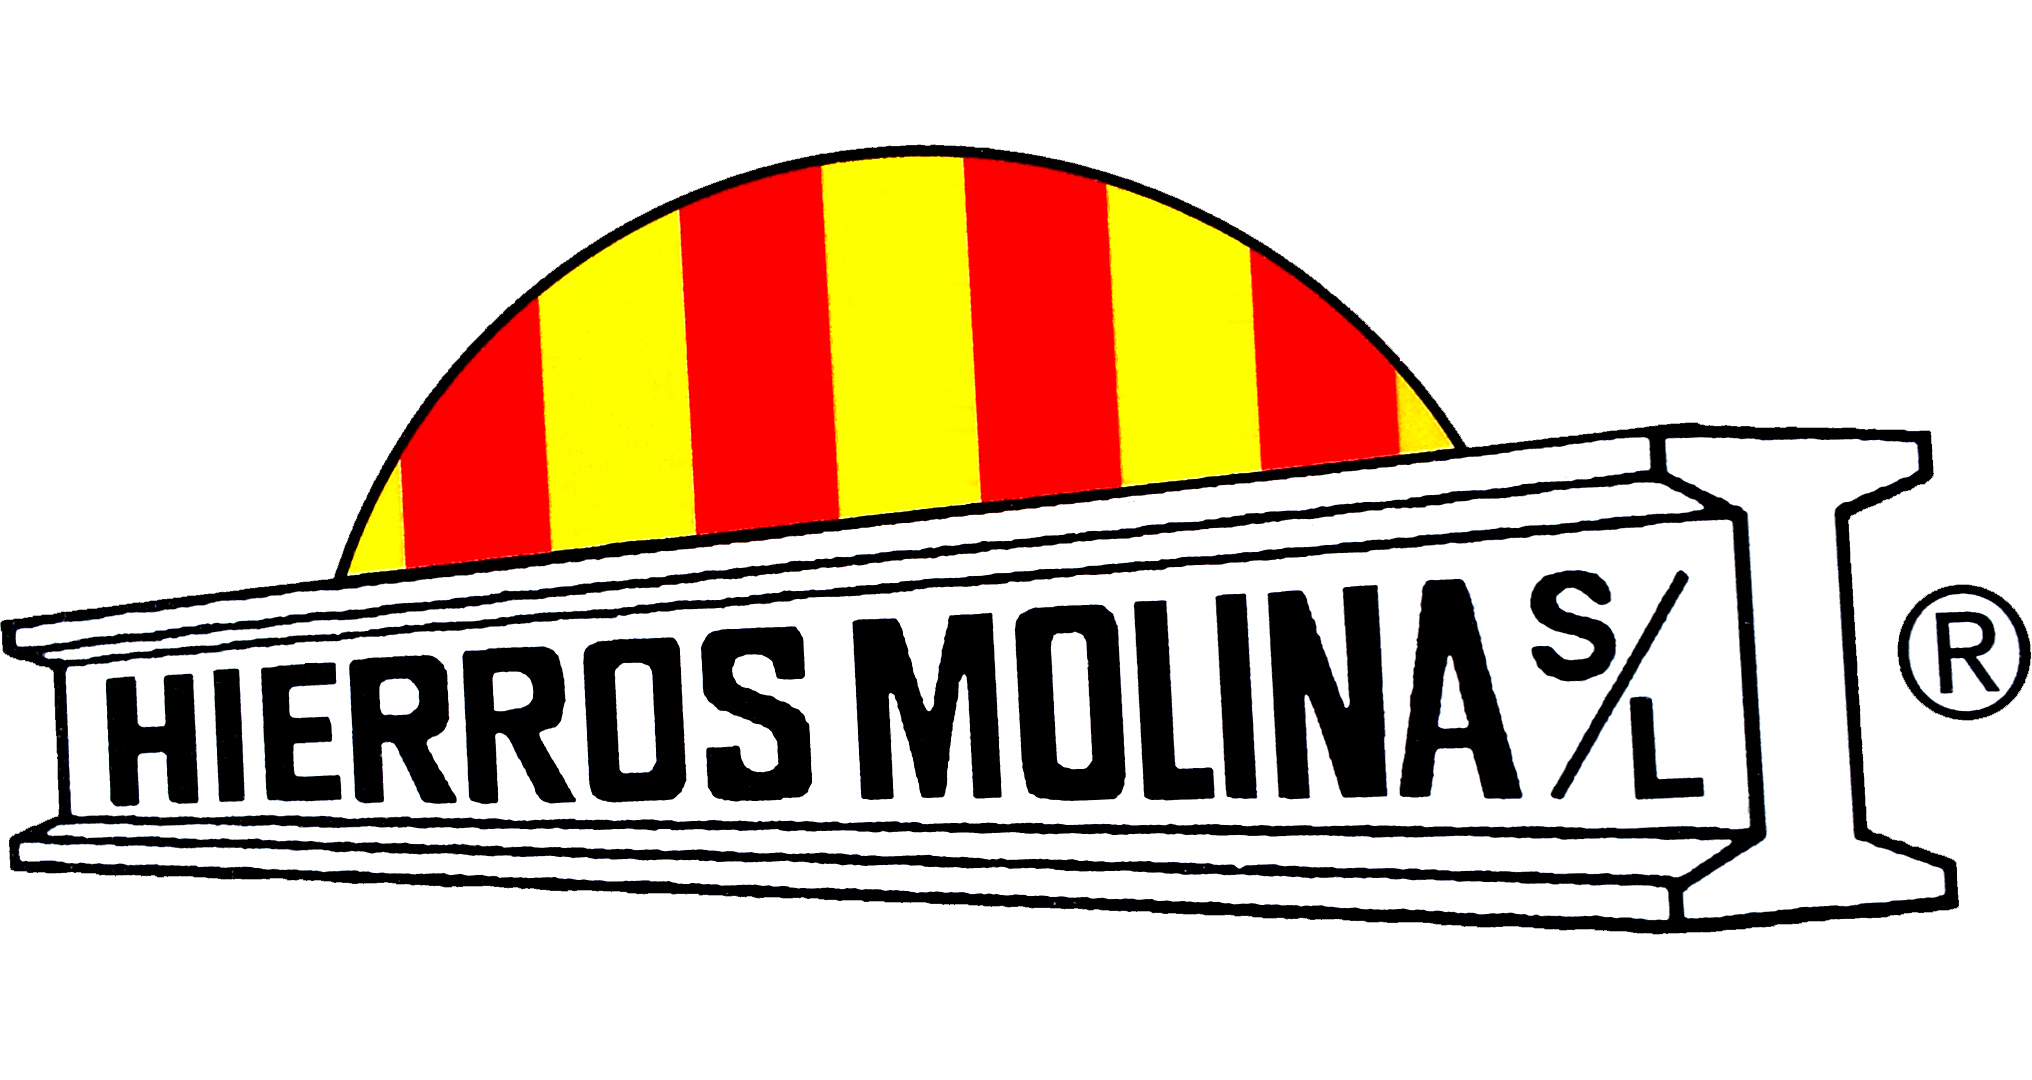 Hierros Molina S.L.